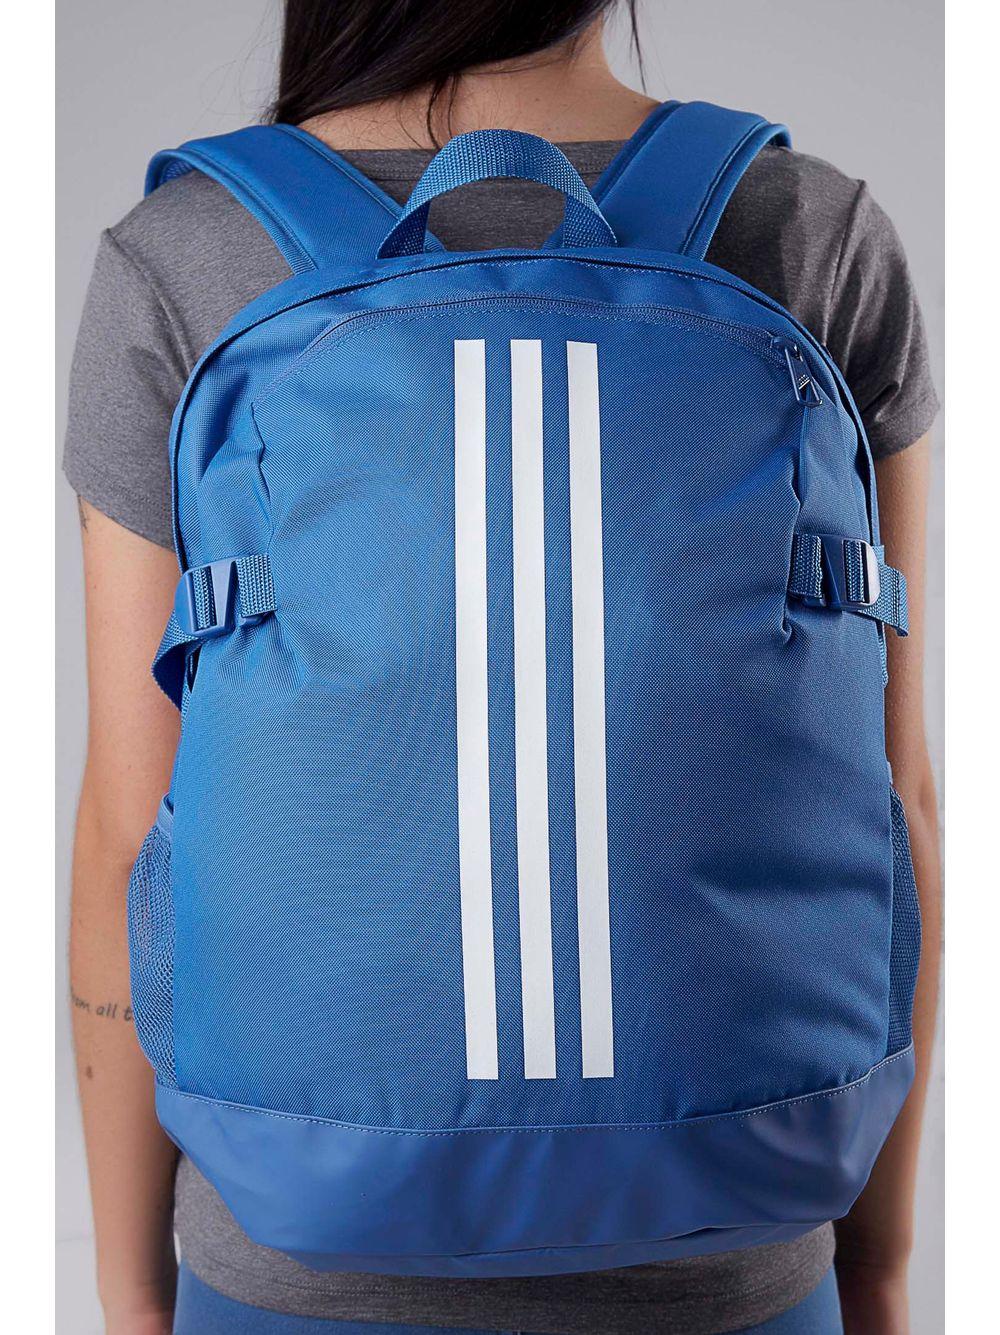 de4f753fb Mochila Adidas Bp Power Iv M Azul - pittol